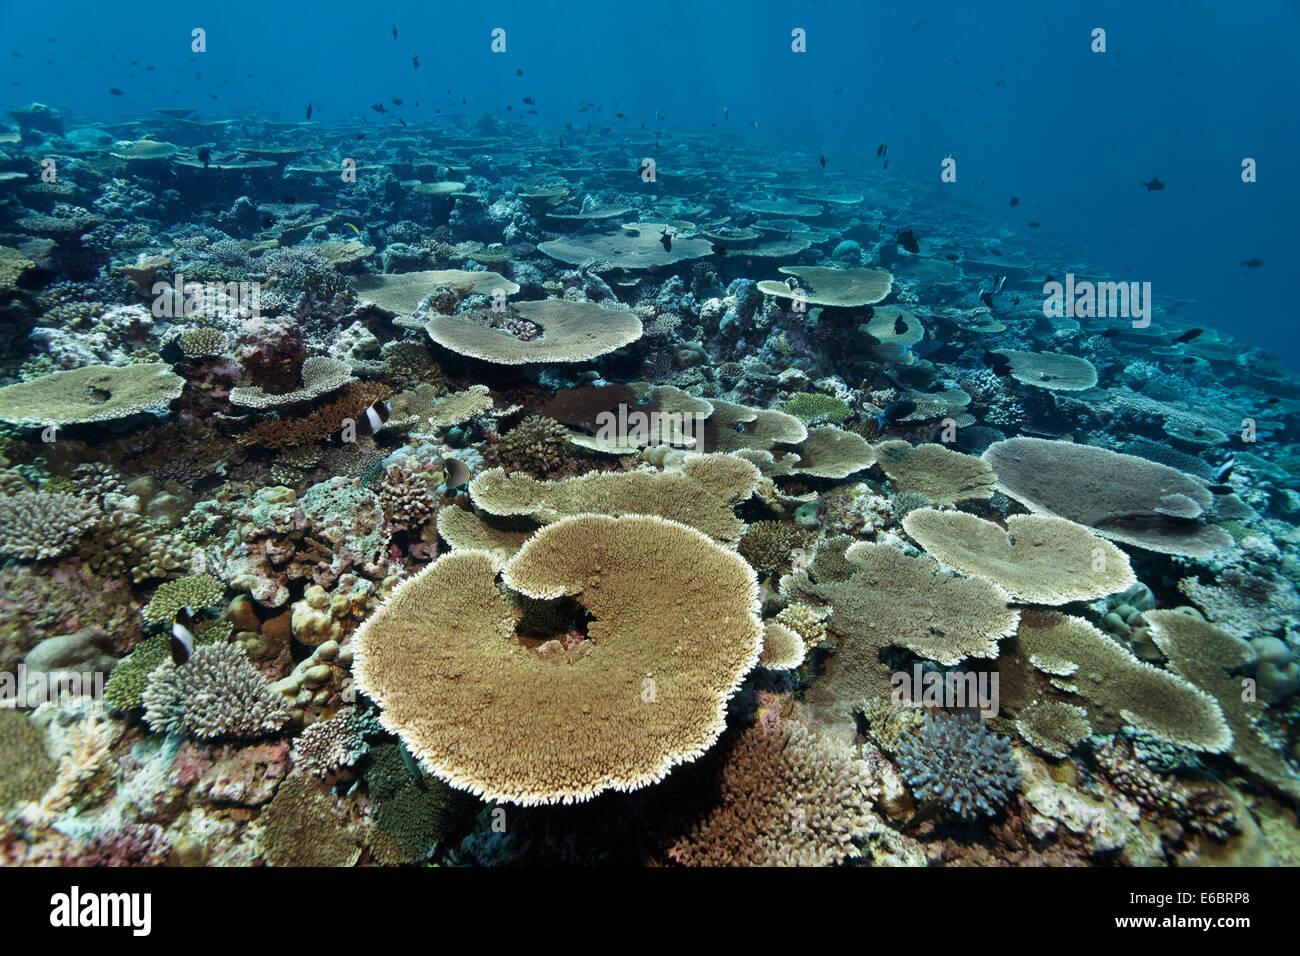 Reef flat with Acropora table coral (Acropora hyacinthus), Indian Ocean, Bolifushi, South Malé Atoll, Maldives - Stock Image